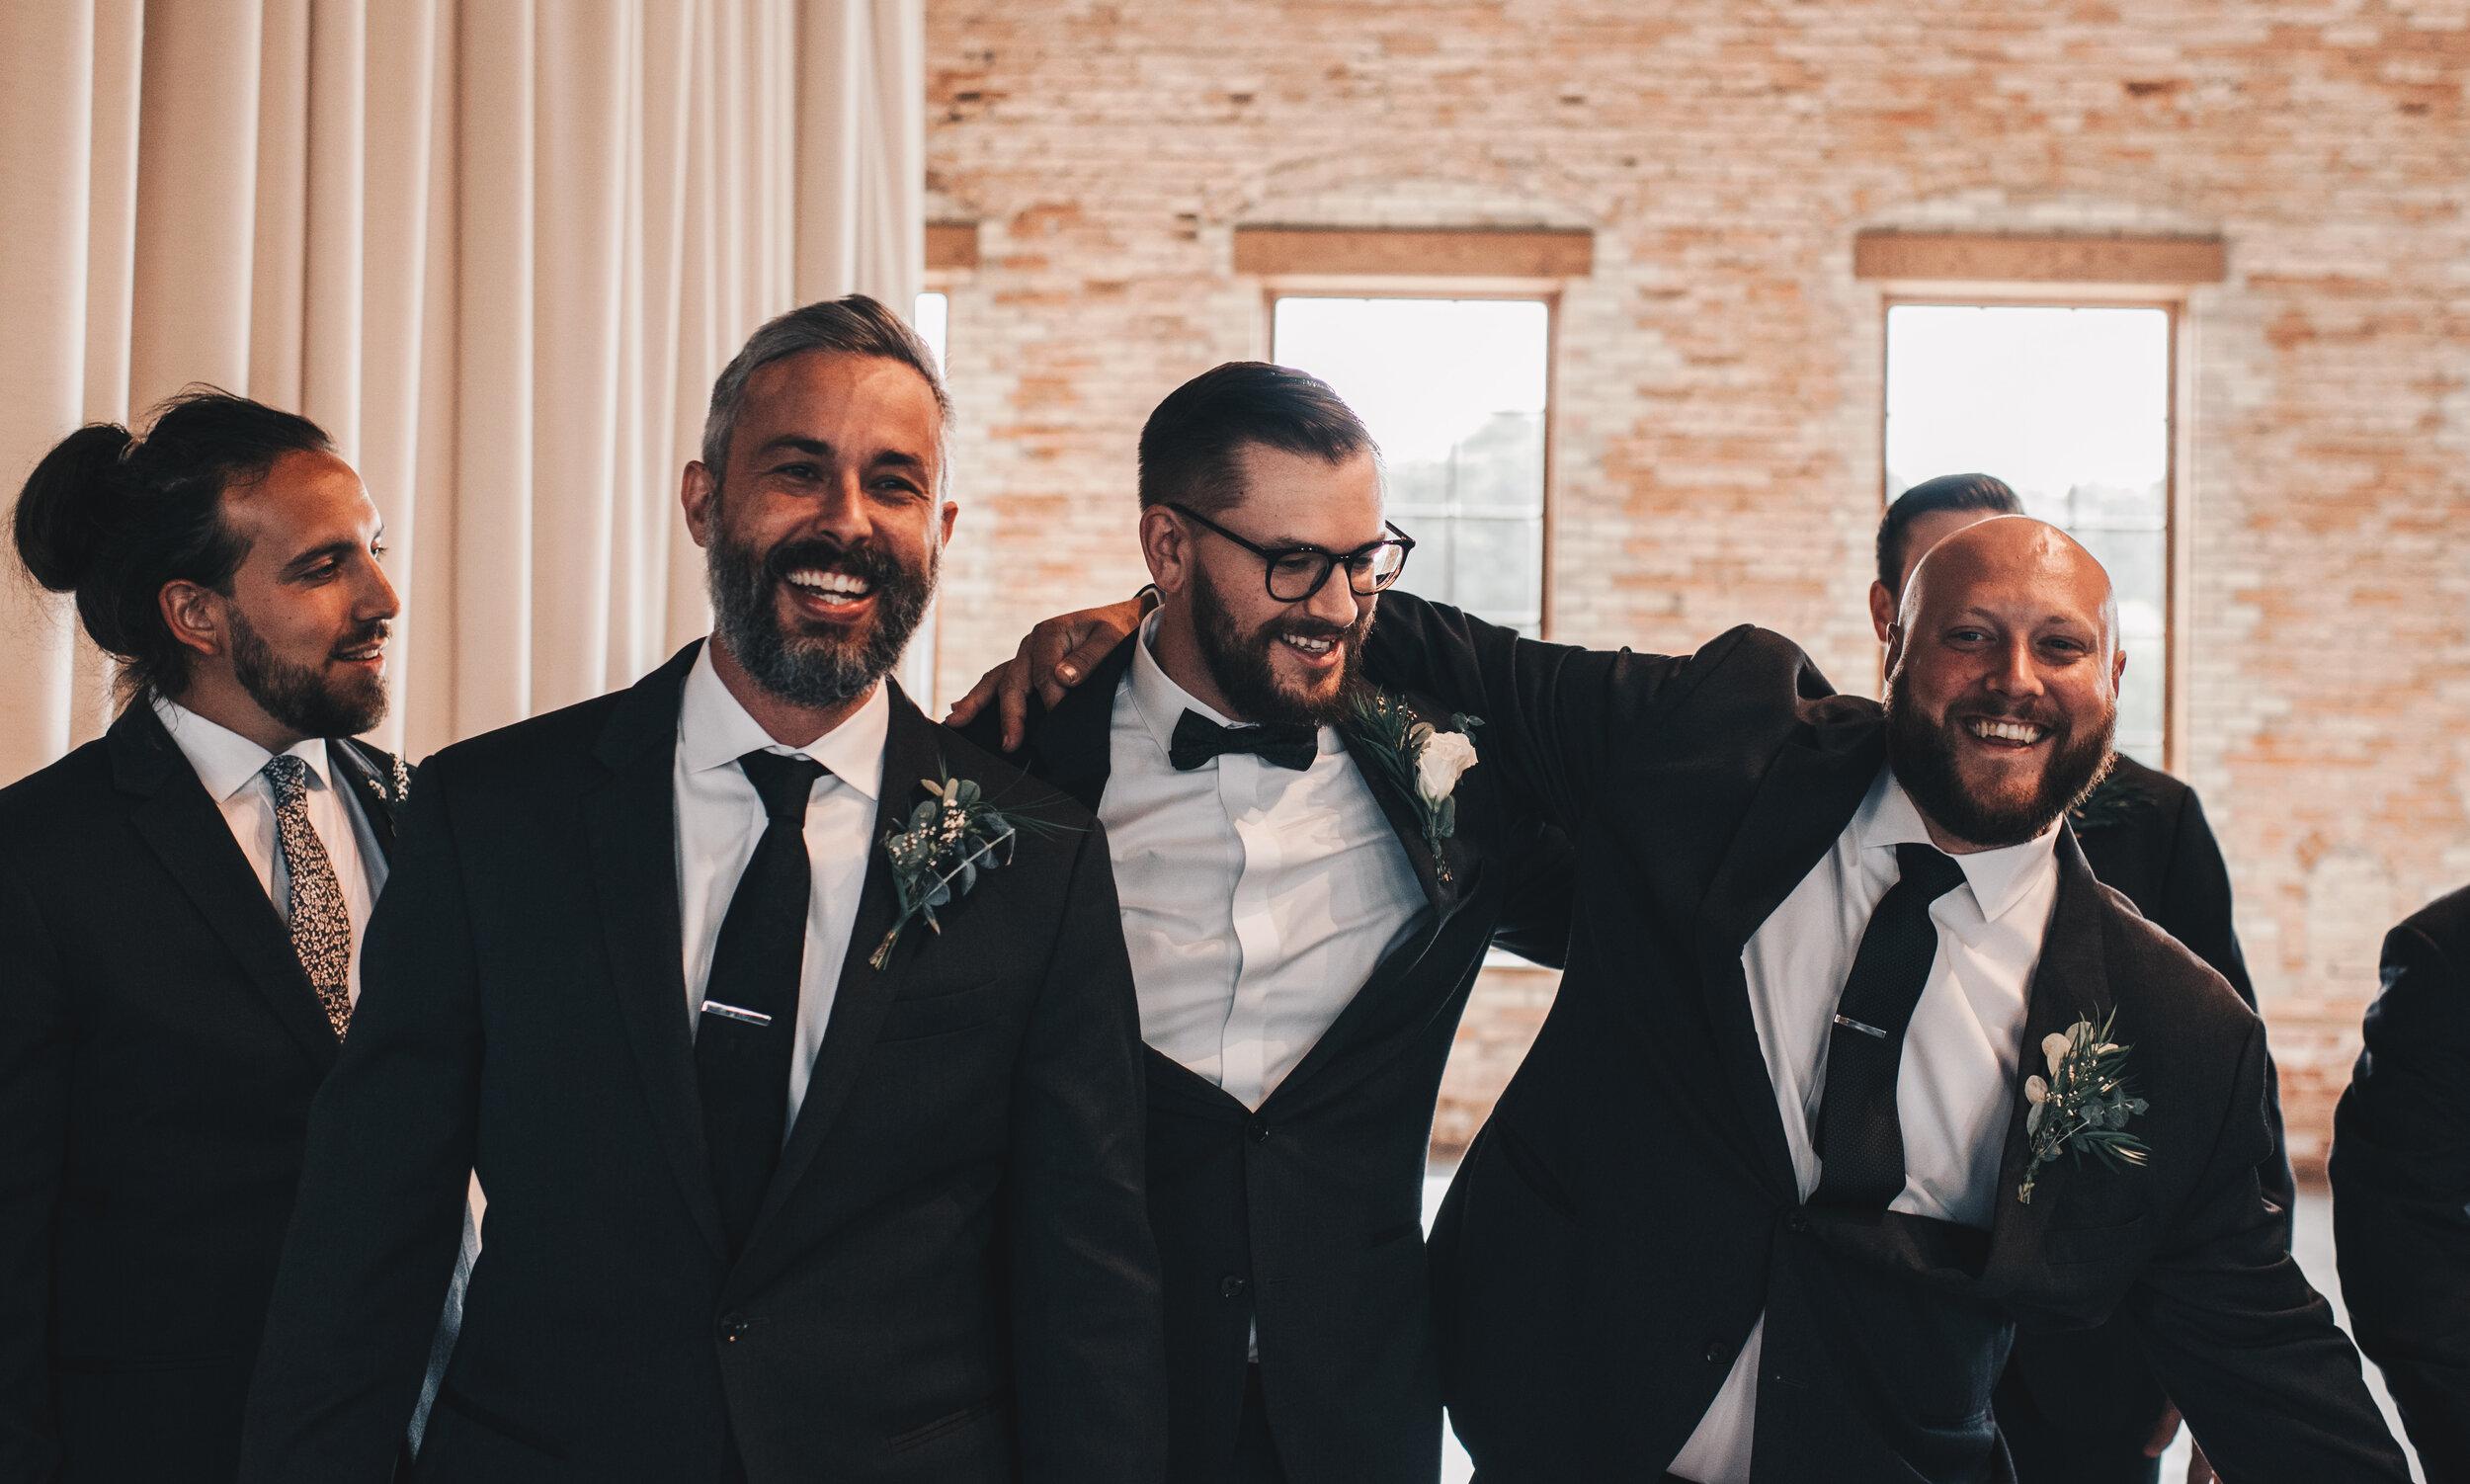 Modern Industrial Wedding, The Brix on the Fox, The BRIX, Chicago Industrial Wedding, Modern Midwest Wedding, The Brix on the Fox Wedding, The BRIX Wedding, Industrial Modern Groomsmen Photos